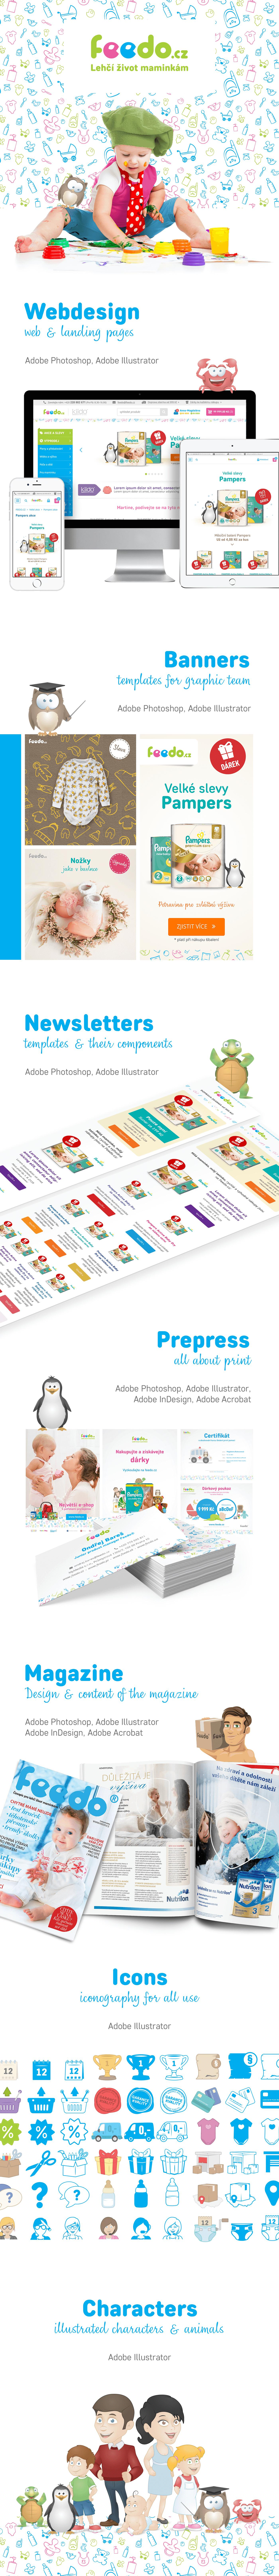 Adobe Portfolio eshop Webdesign prepress vector characters banners newsletters Manuals